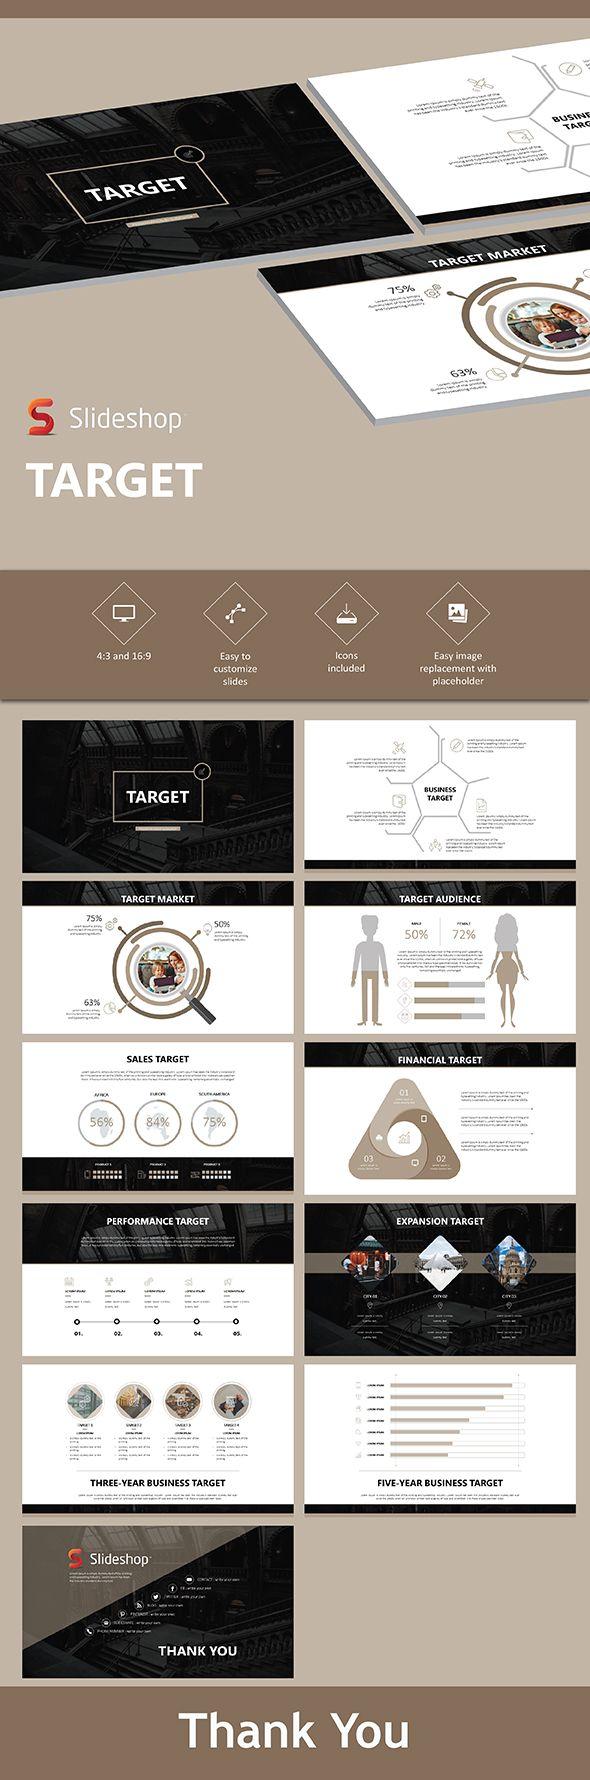 Target - PowerPoint Templates Presentation Templates